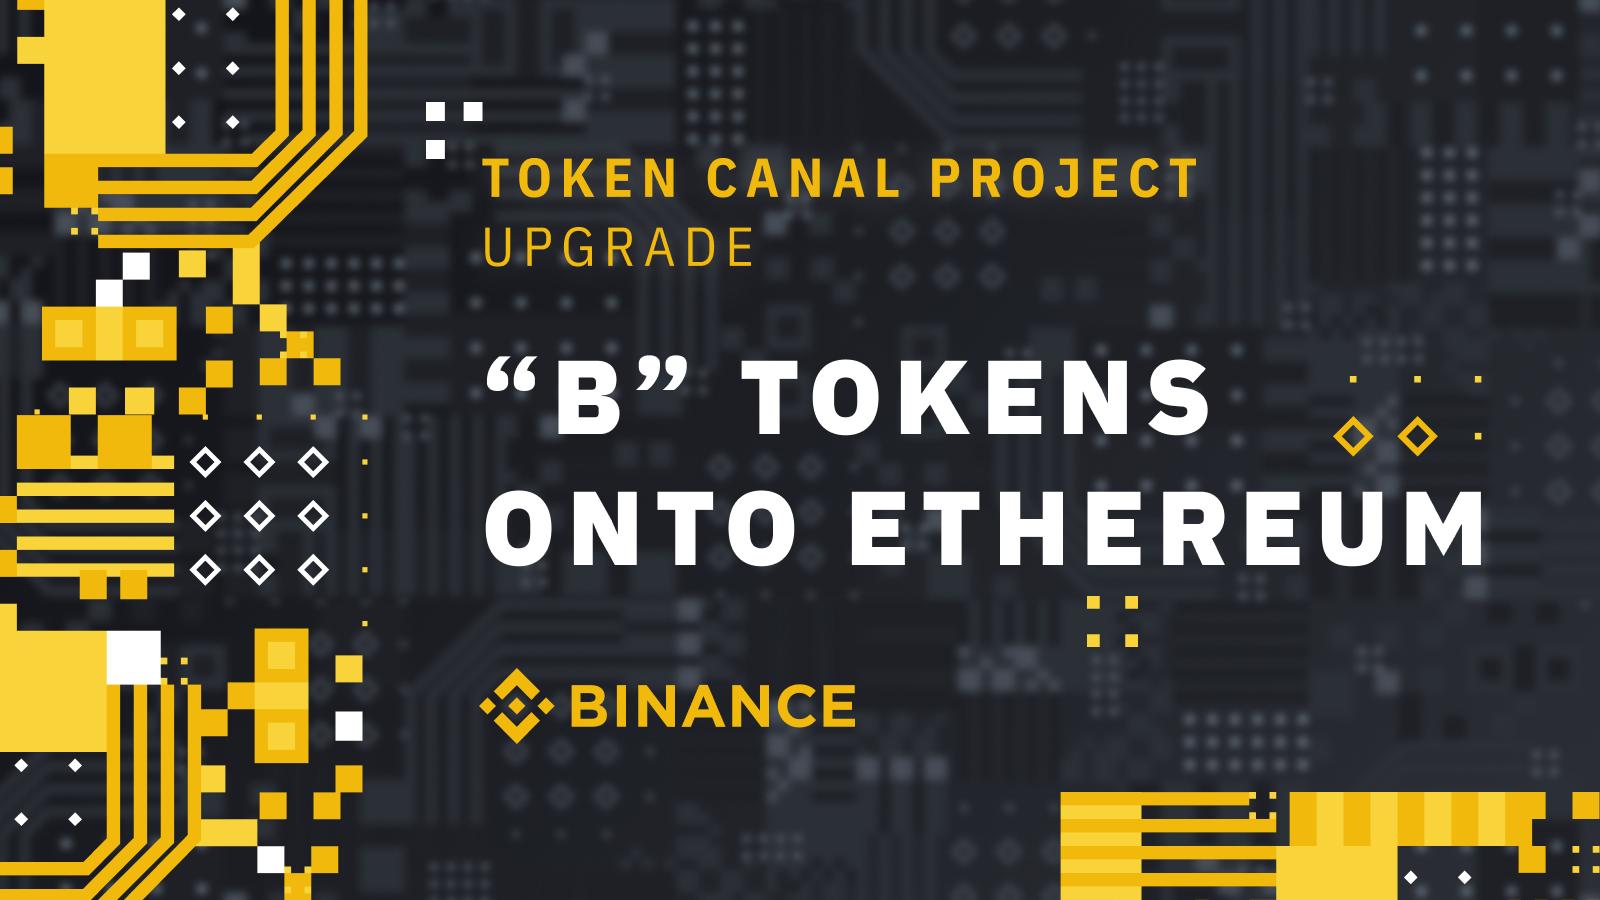 Token Canal Upgrade: Binance Wrapped BTokens on Ethereum, Panama Turns into Bridge | Binance Blog